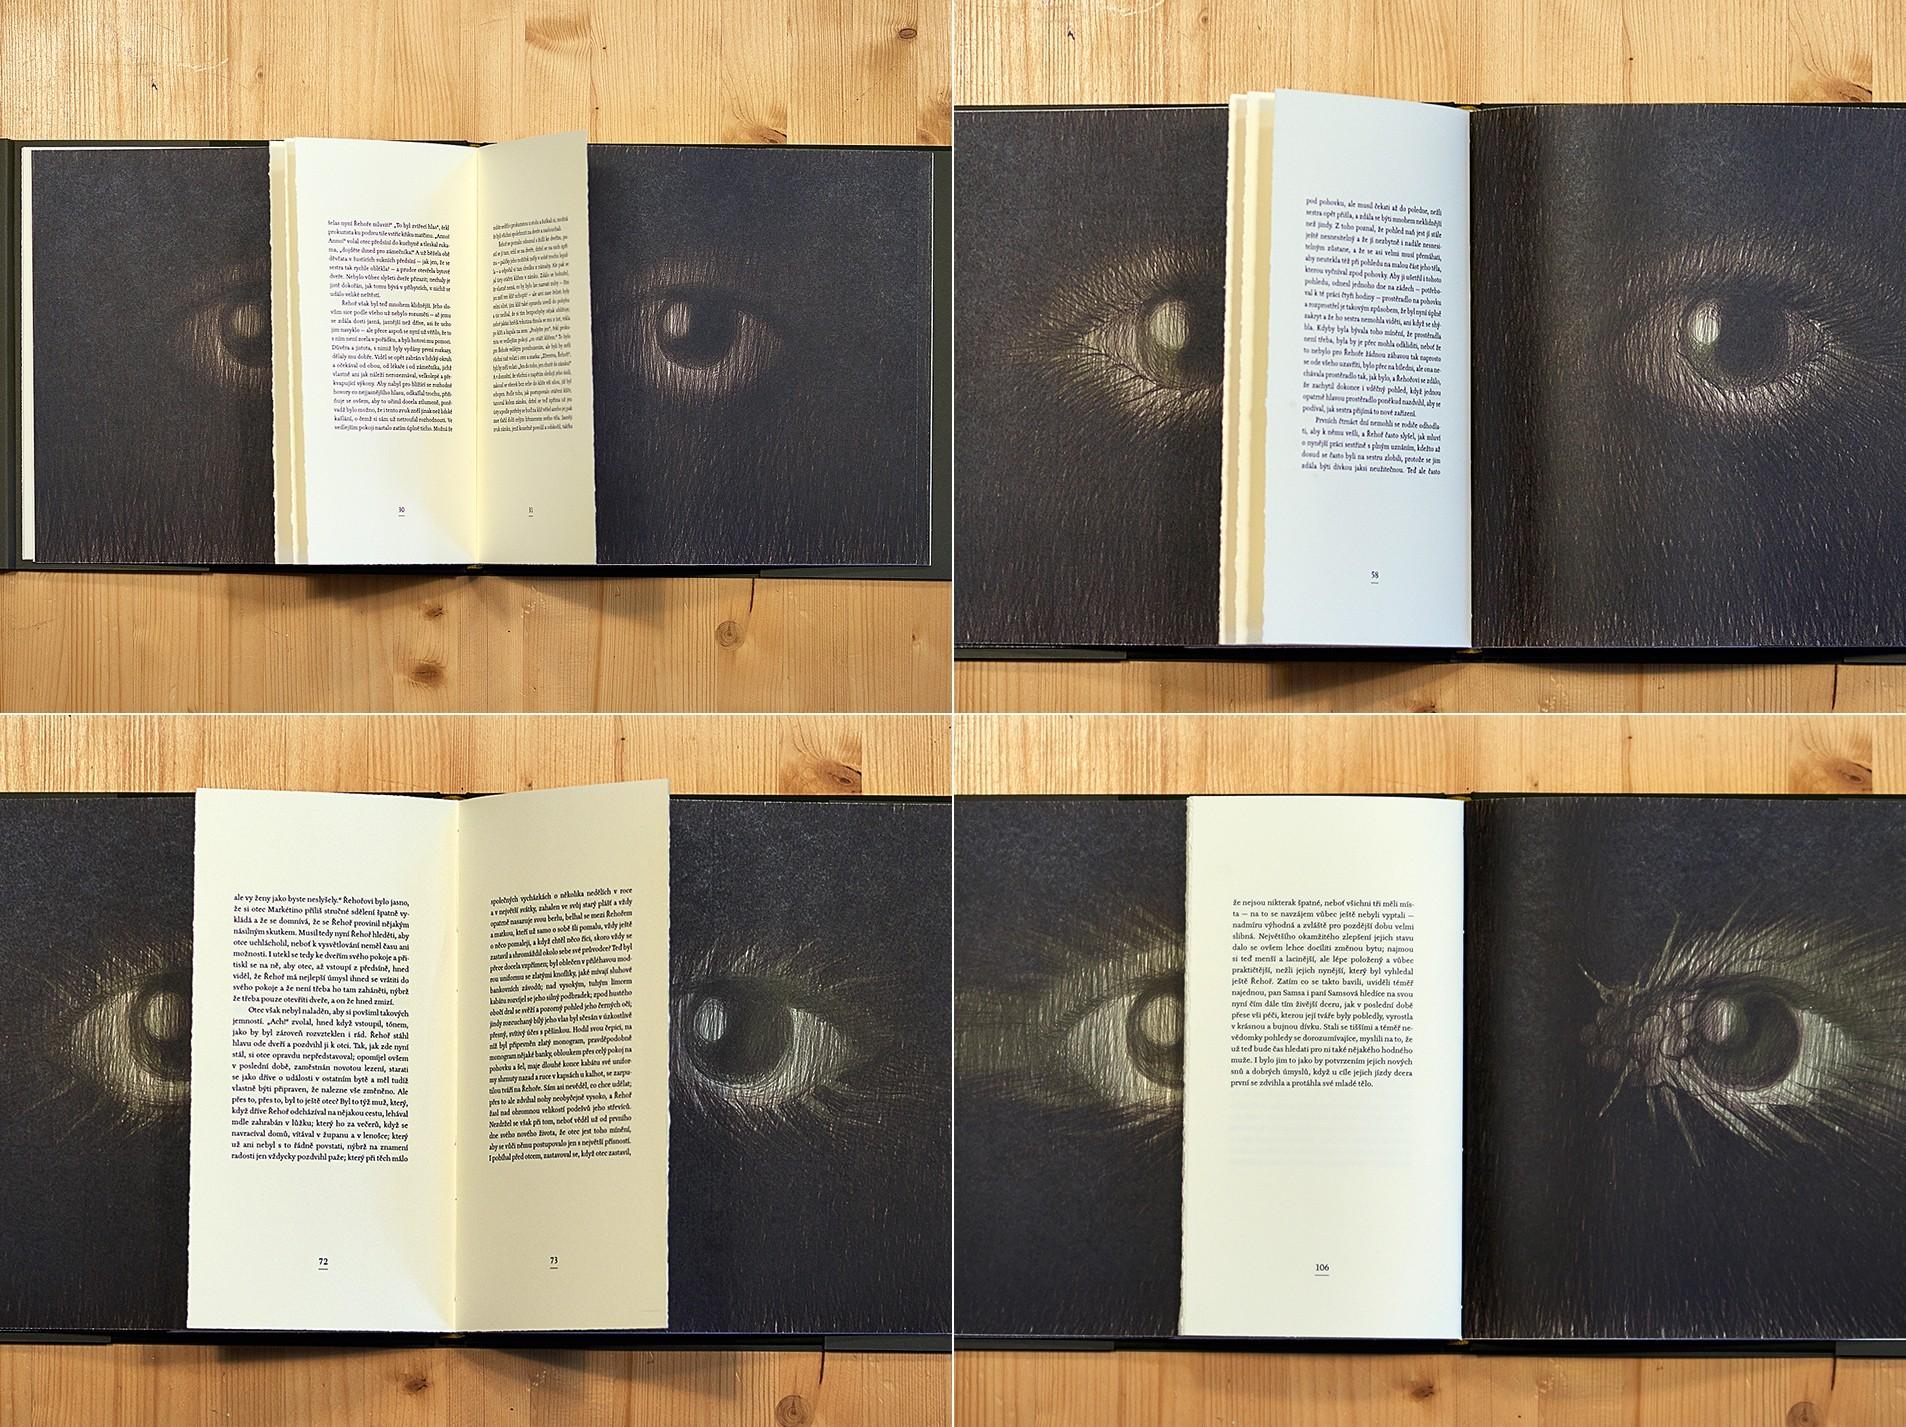 calendario 2019 italiano da stampare Kafka Metamorphosis